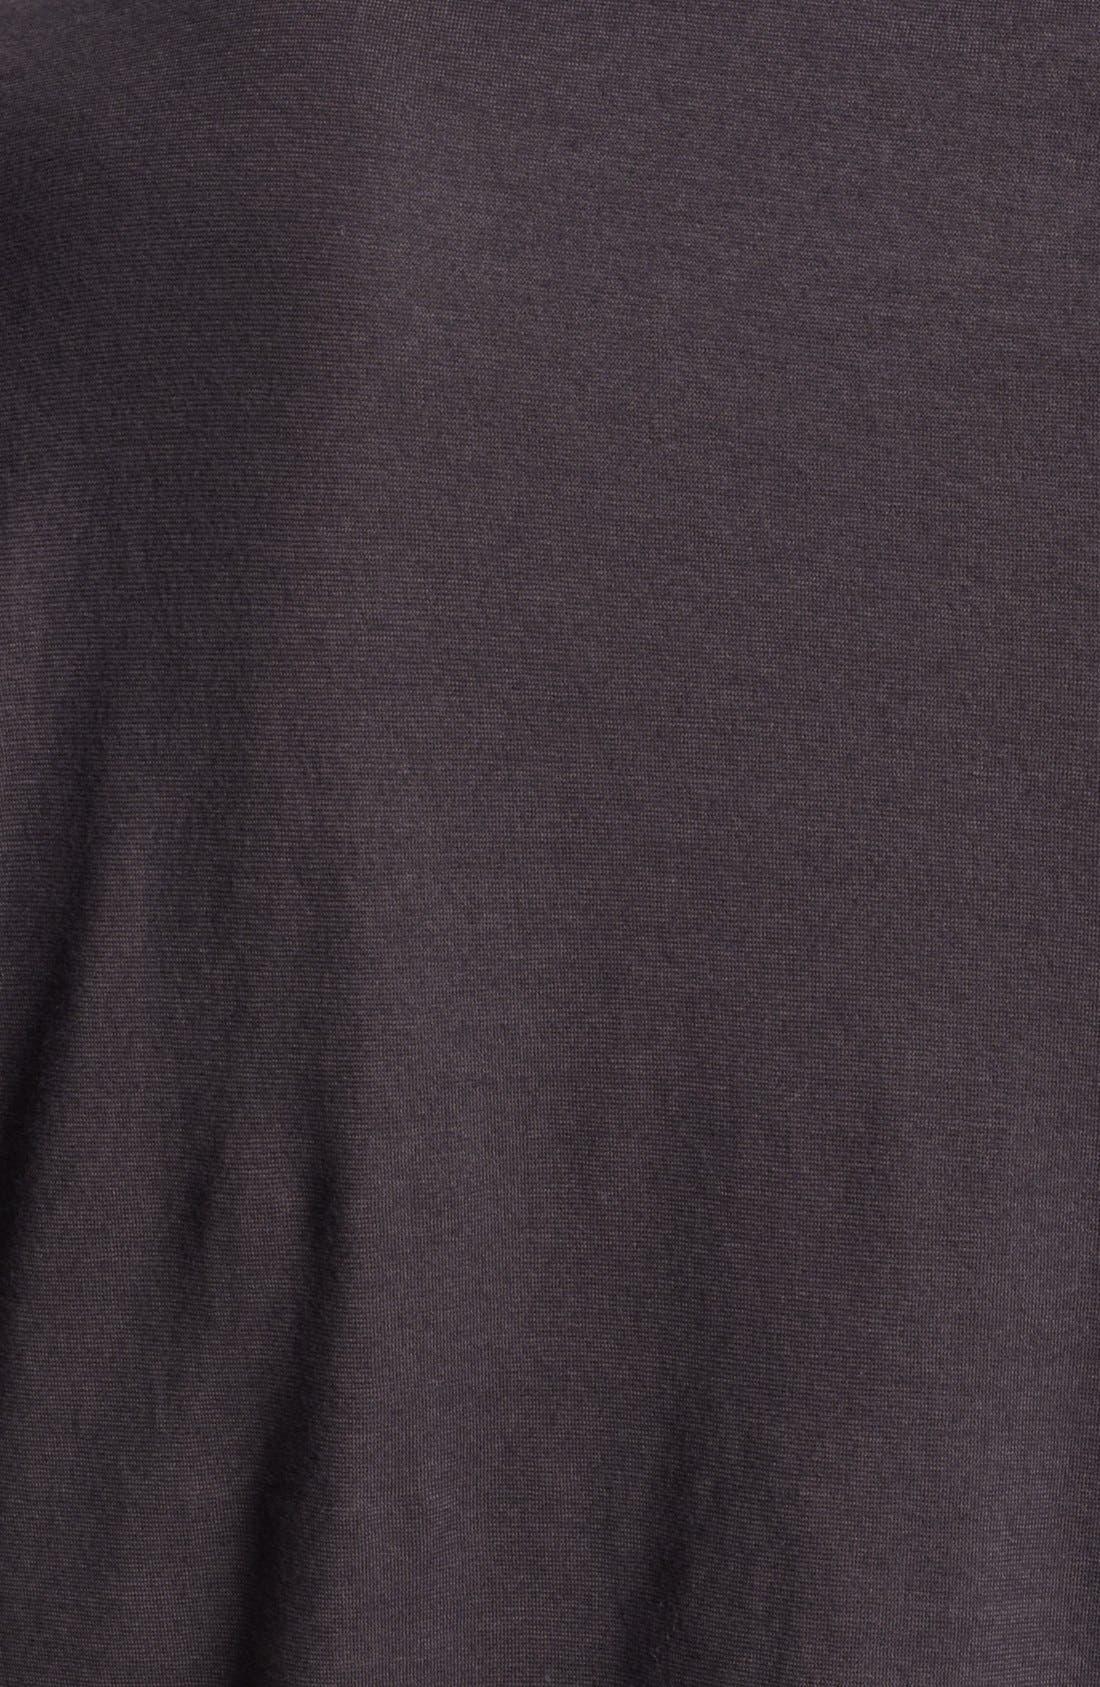 Alternate Image 3  - Dolce&Gabbana 'Steve McQueen' T-Shirt